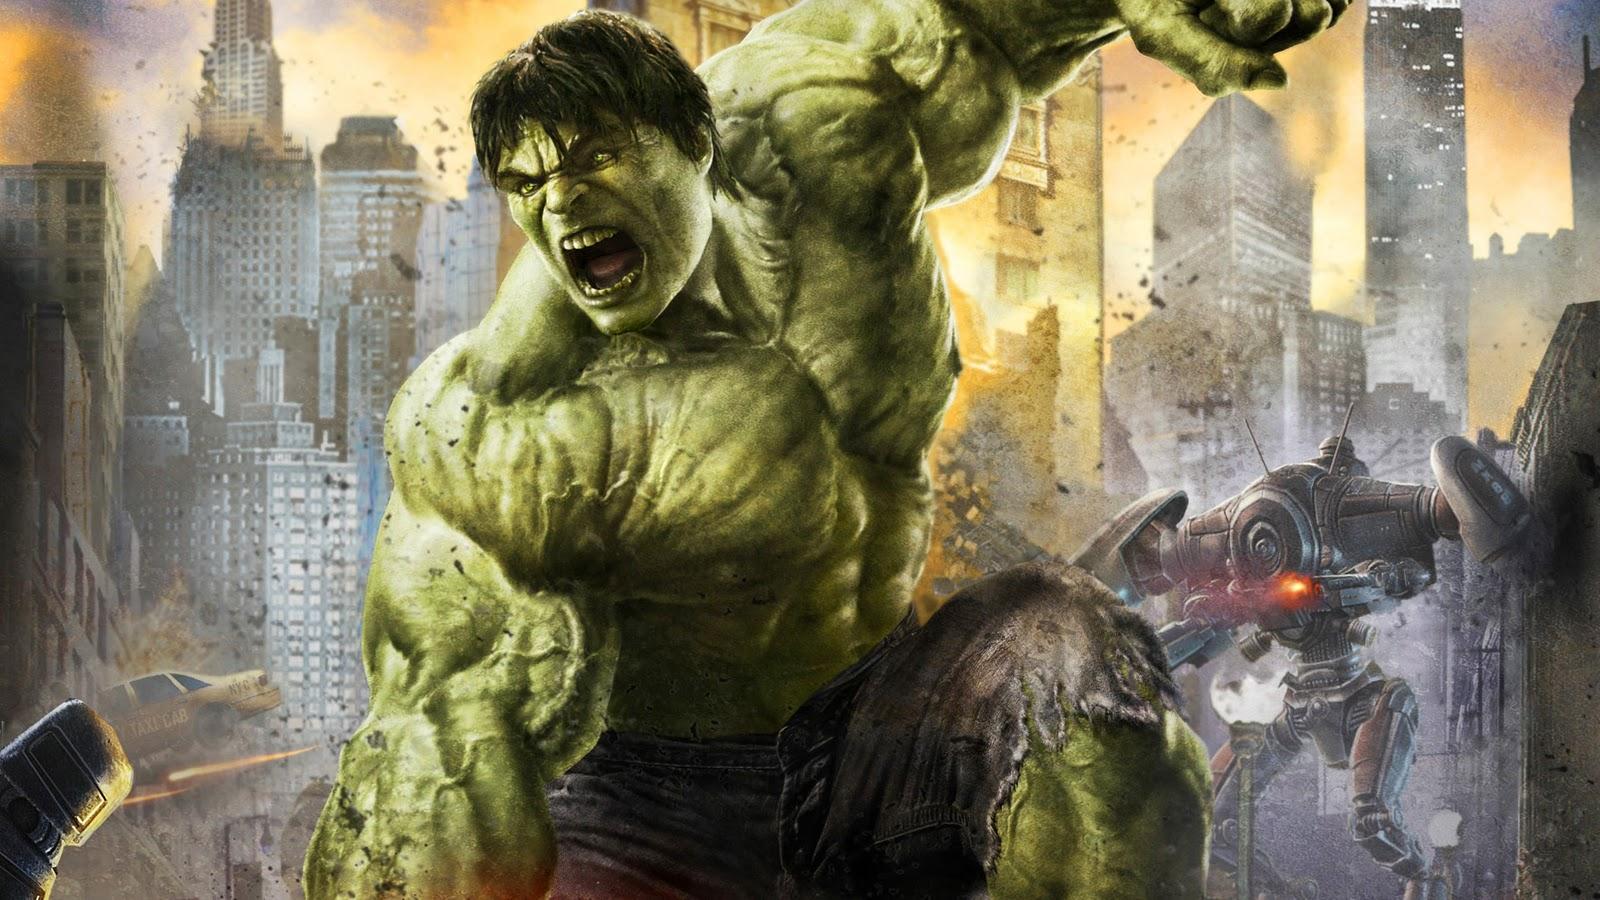 Free Download Hulk Bureaublad Achtergrond Grote Boze Hulk